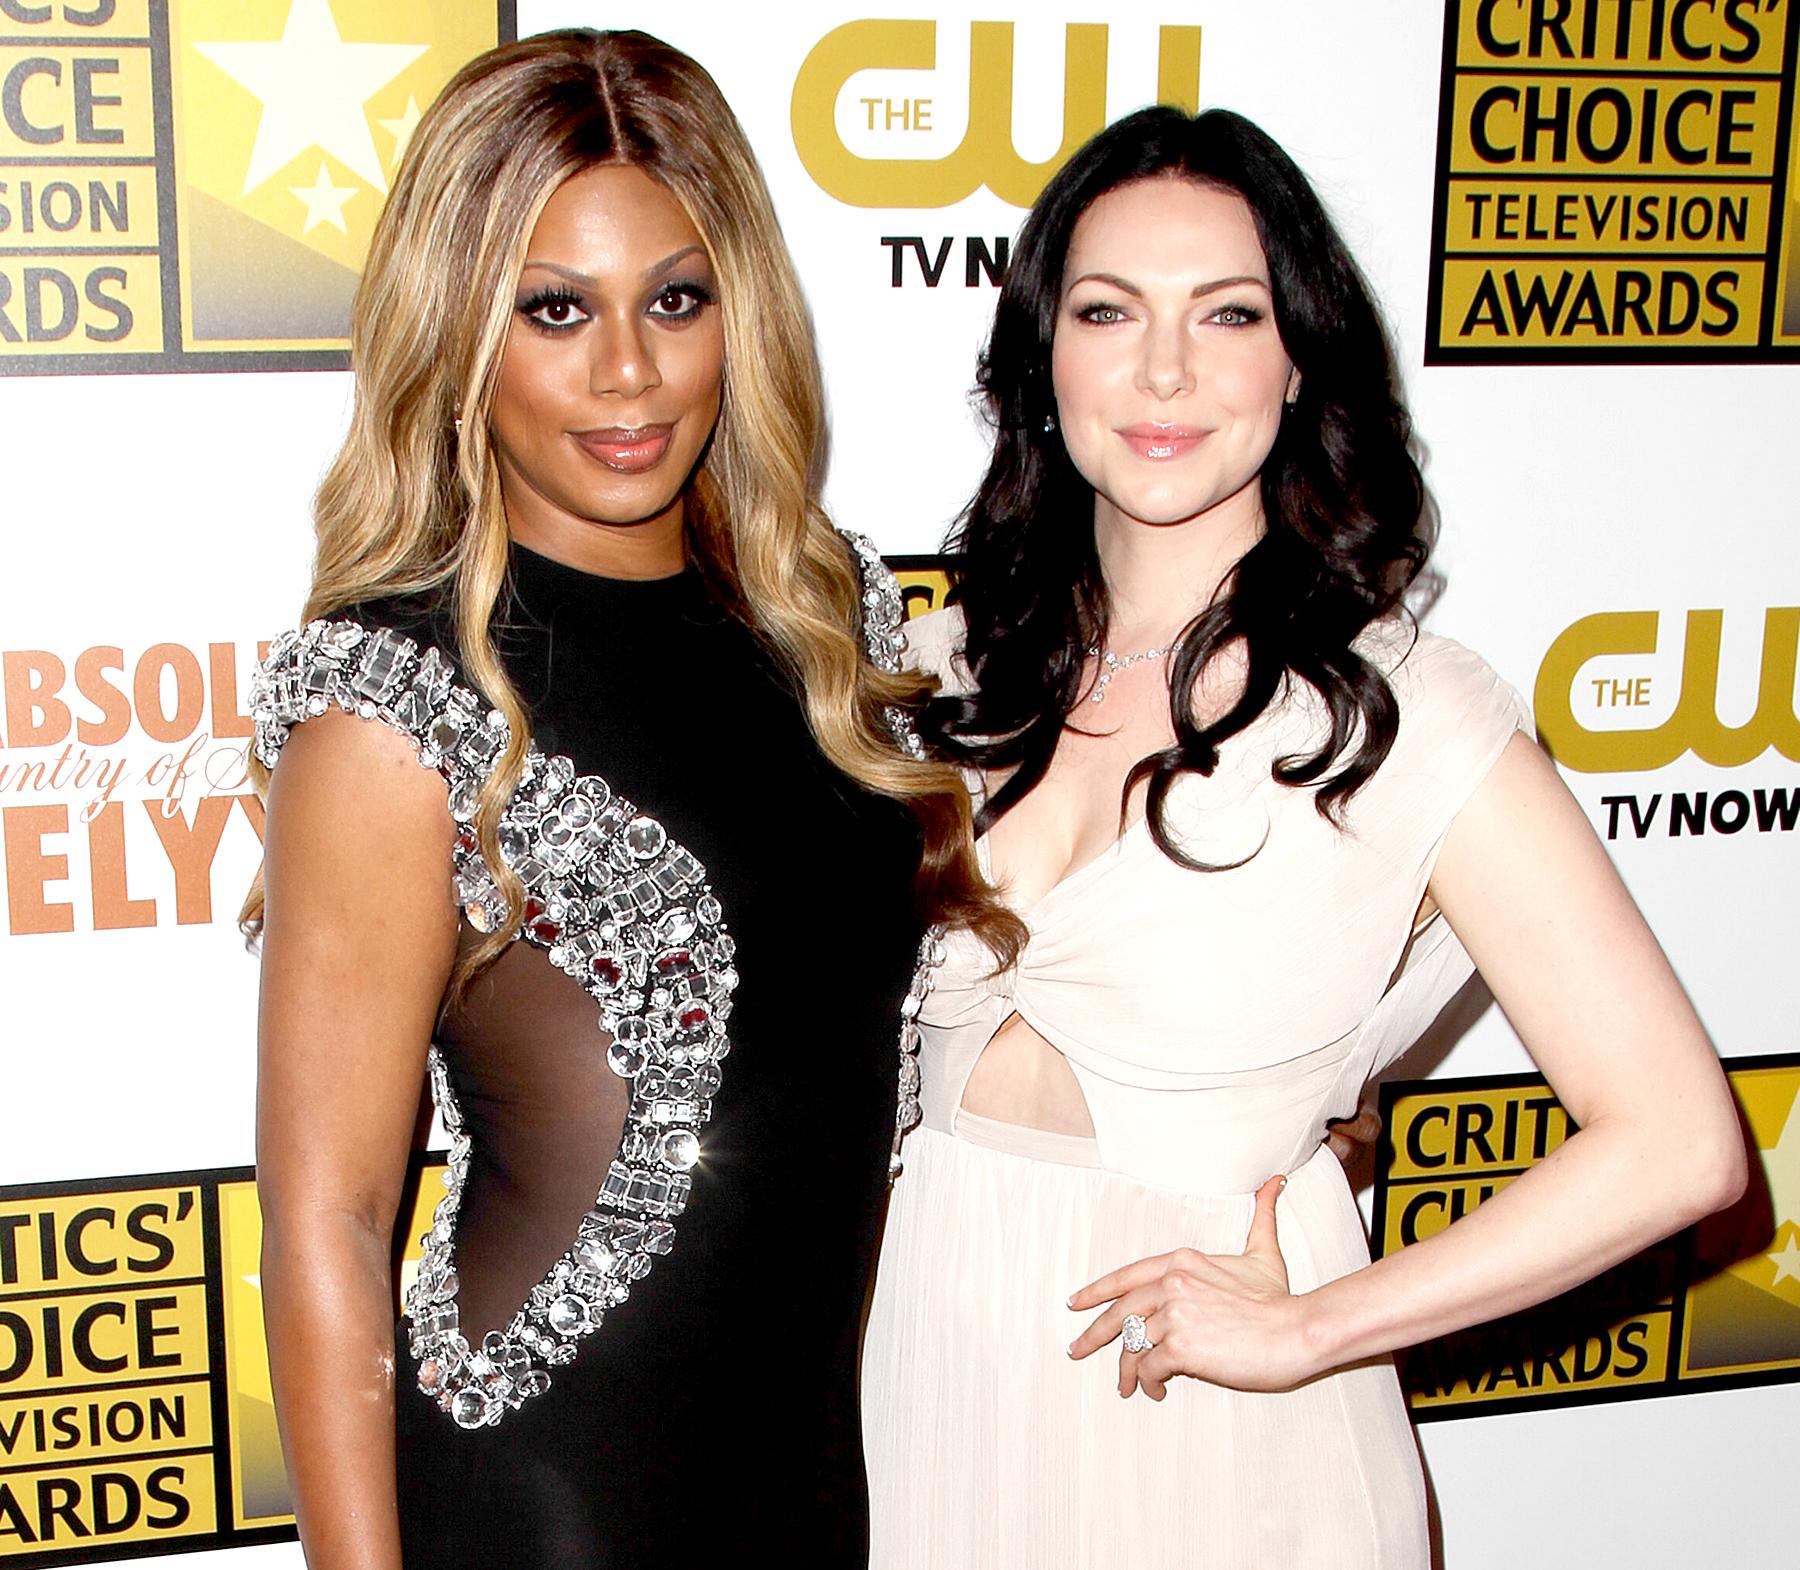 Laverne-Cox-Laura-Prepon - Laverne Cox and Laura Prepon arrive at The 4th Annual Critics' Choice TV Awards June 19th, 2014.